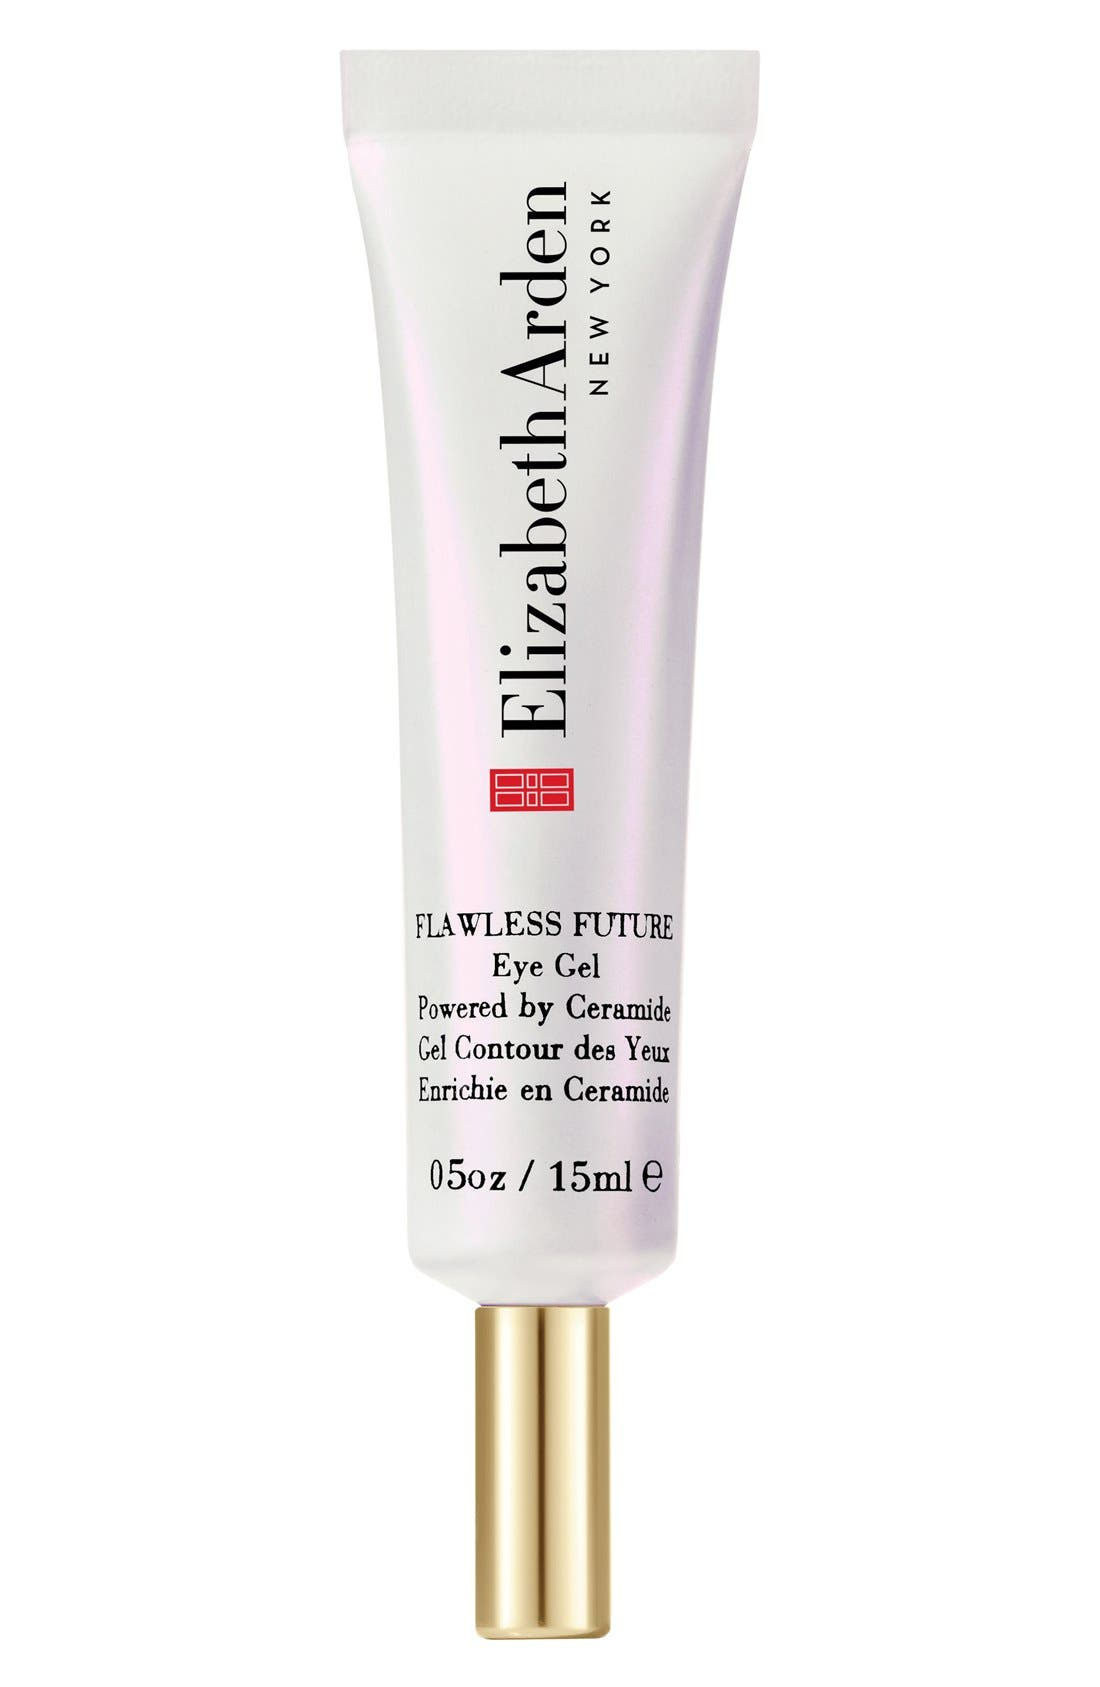 Elizabeth Arden FLAWLESS FUTURE Powered by Ceramide™ Eye Gel